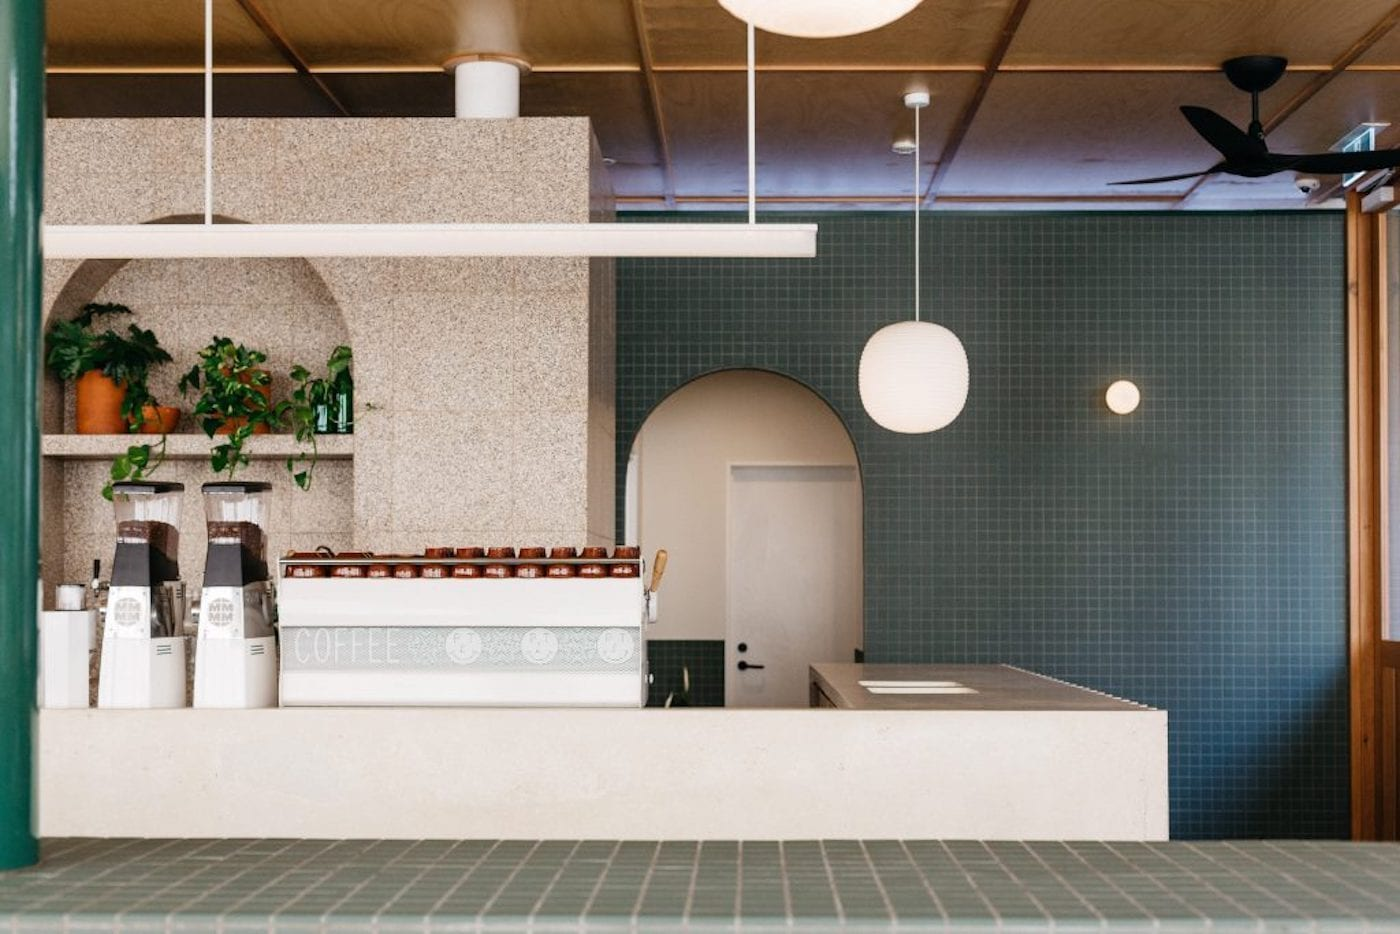 Eco Edition_Sans Arc Studio_Part Time Lover_Architecture interiors 1-min